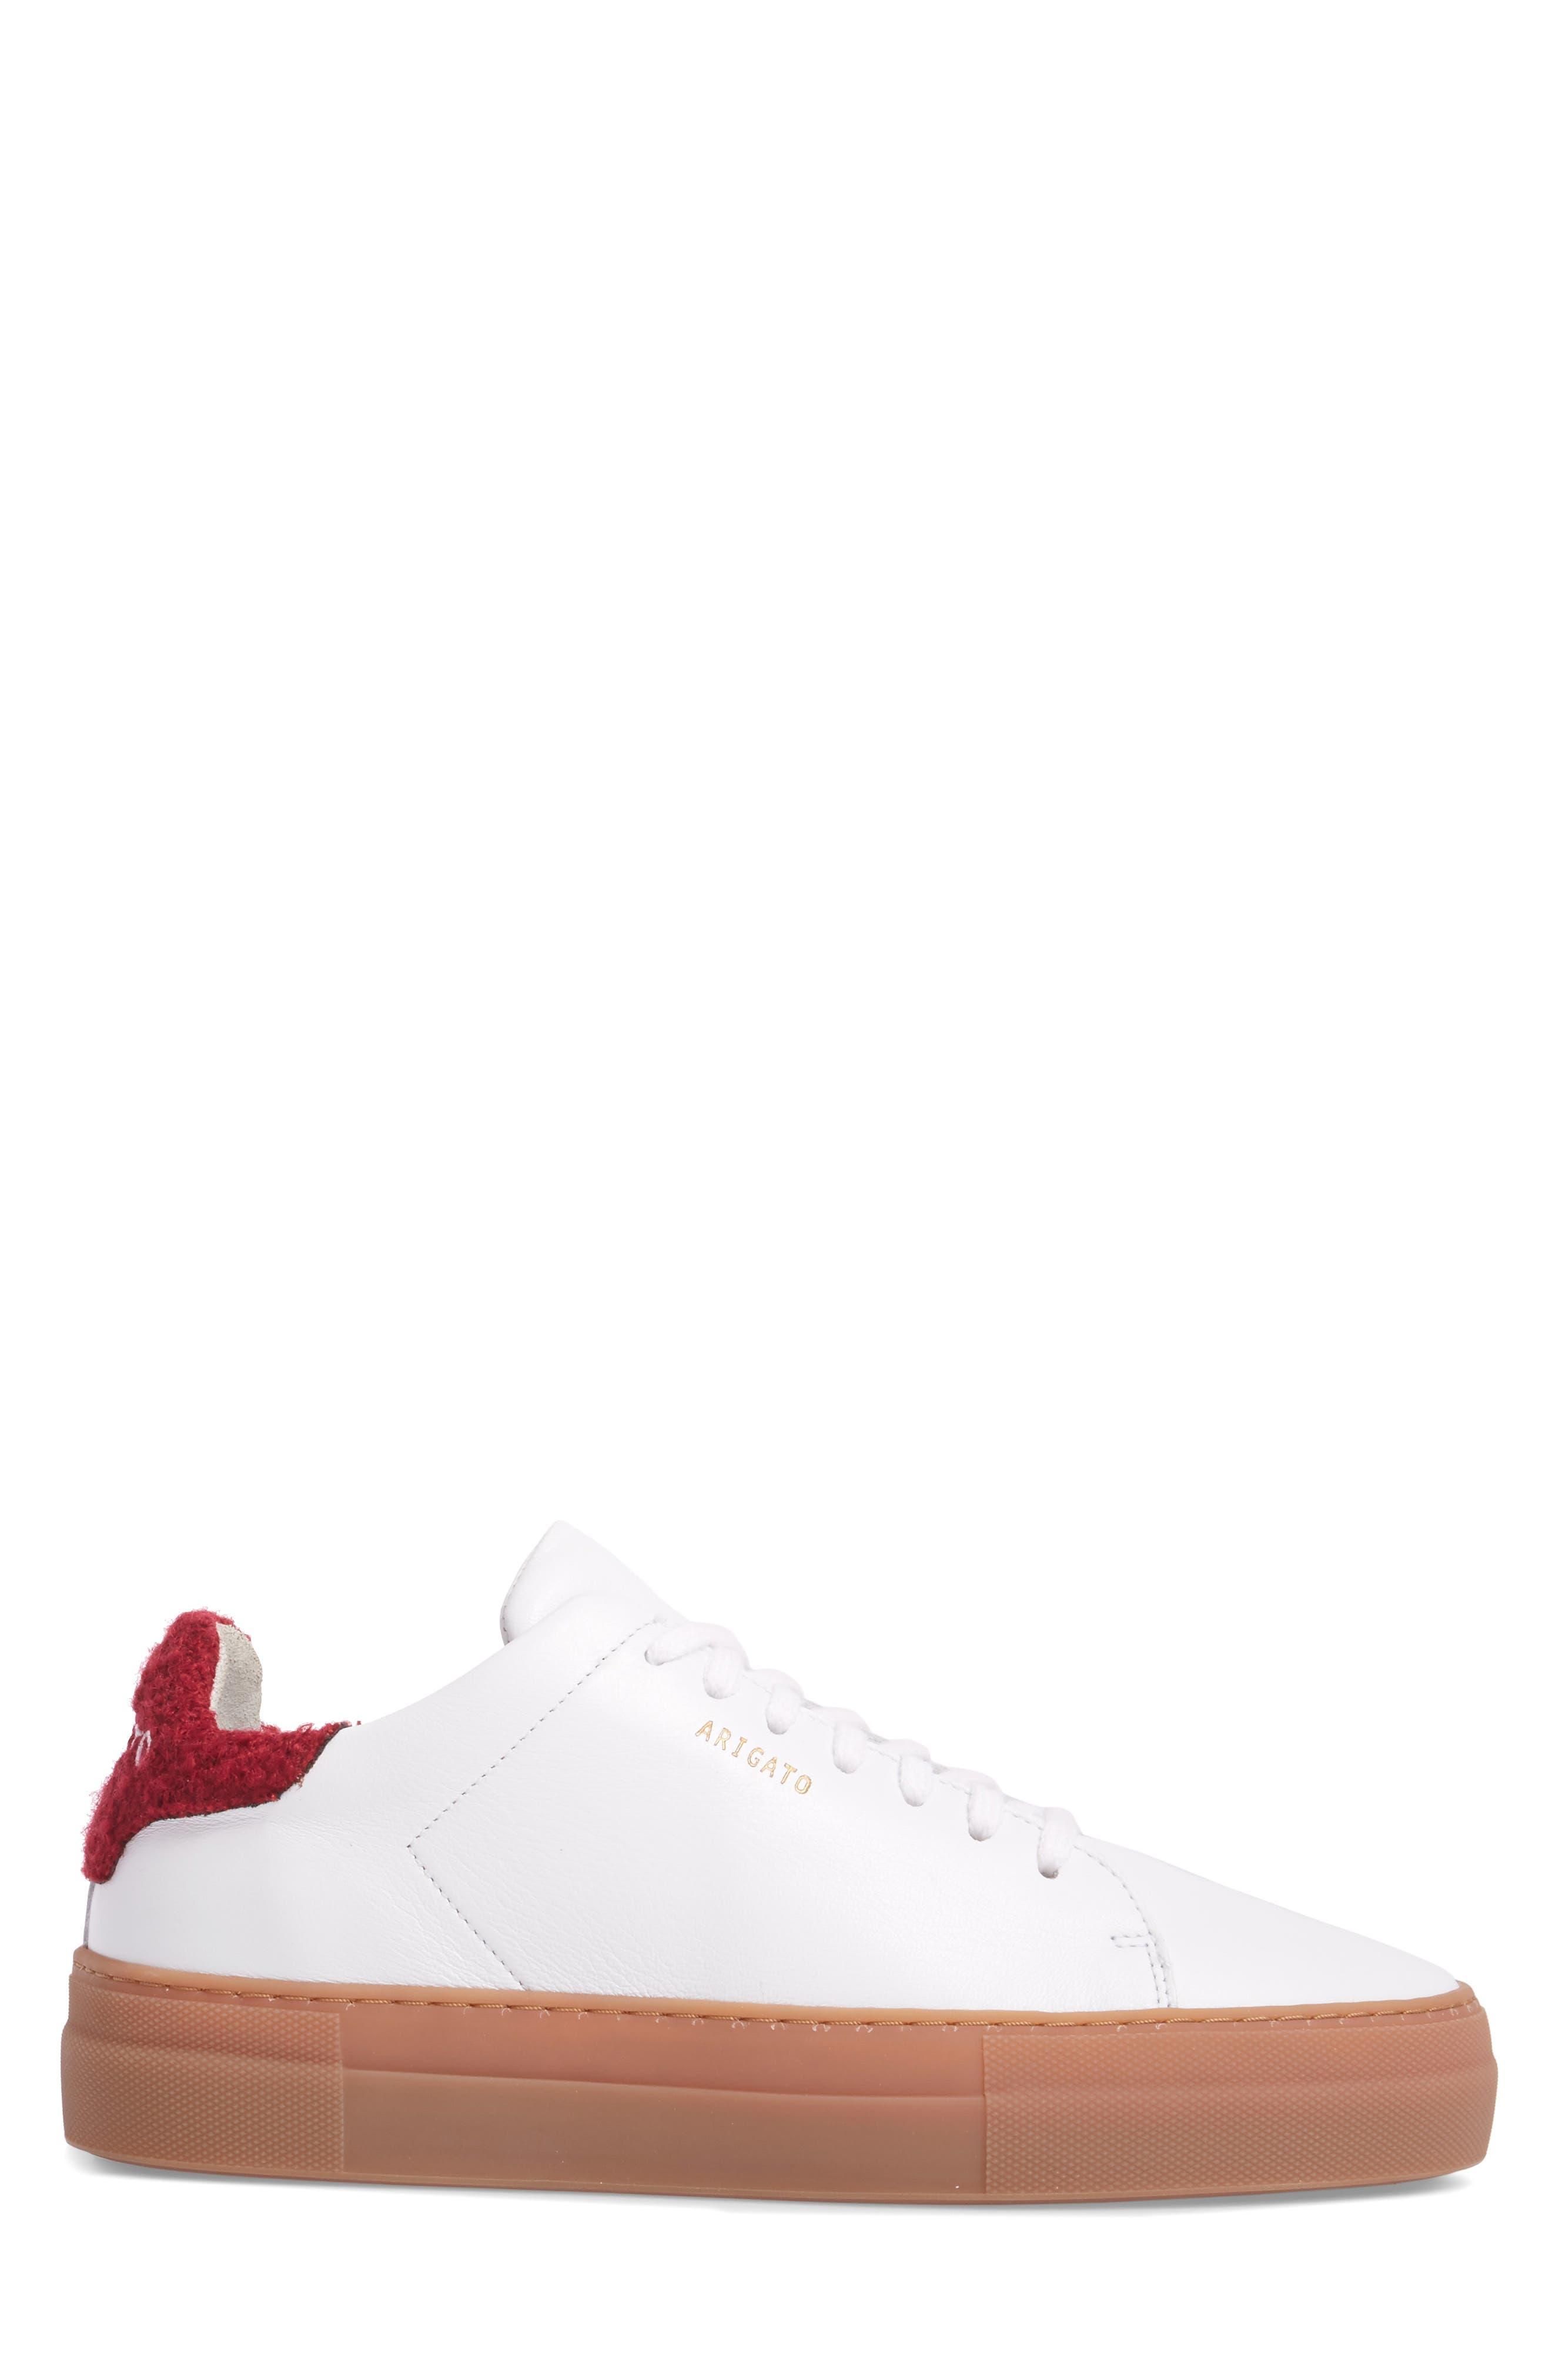 Clean 360 Fuzzy Heel Sneaker,                             Alternate thumbnail 3, color,                             White